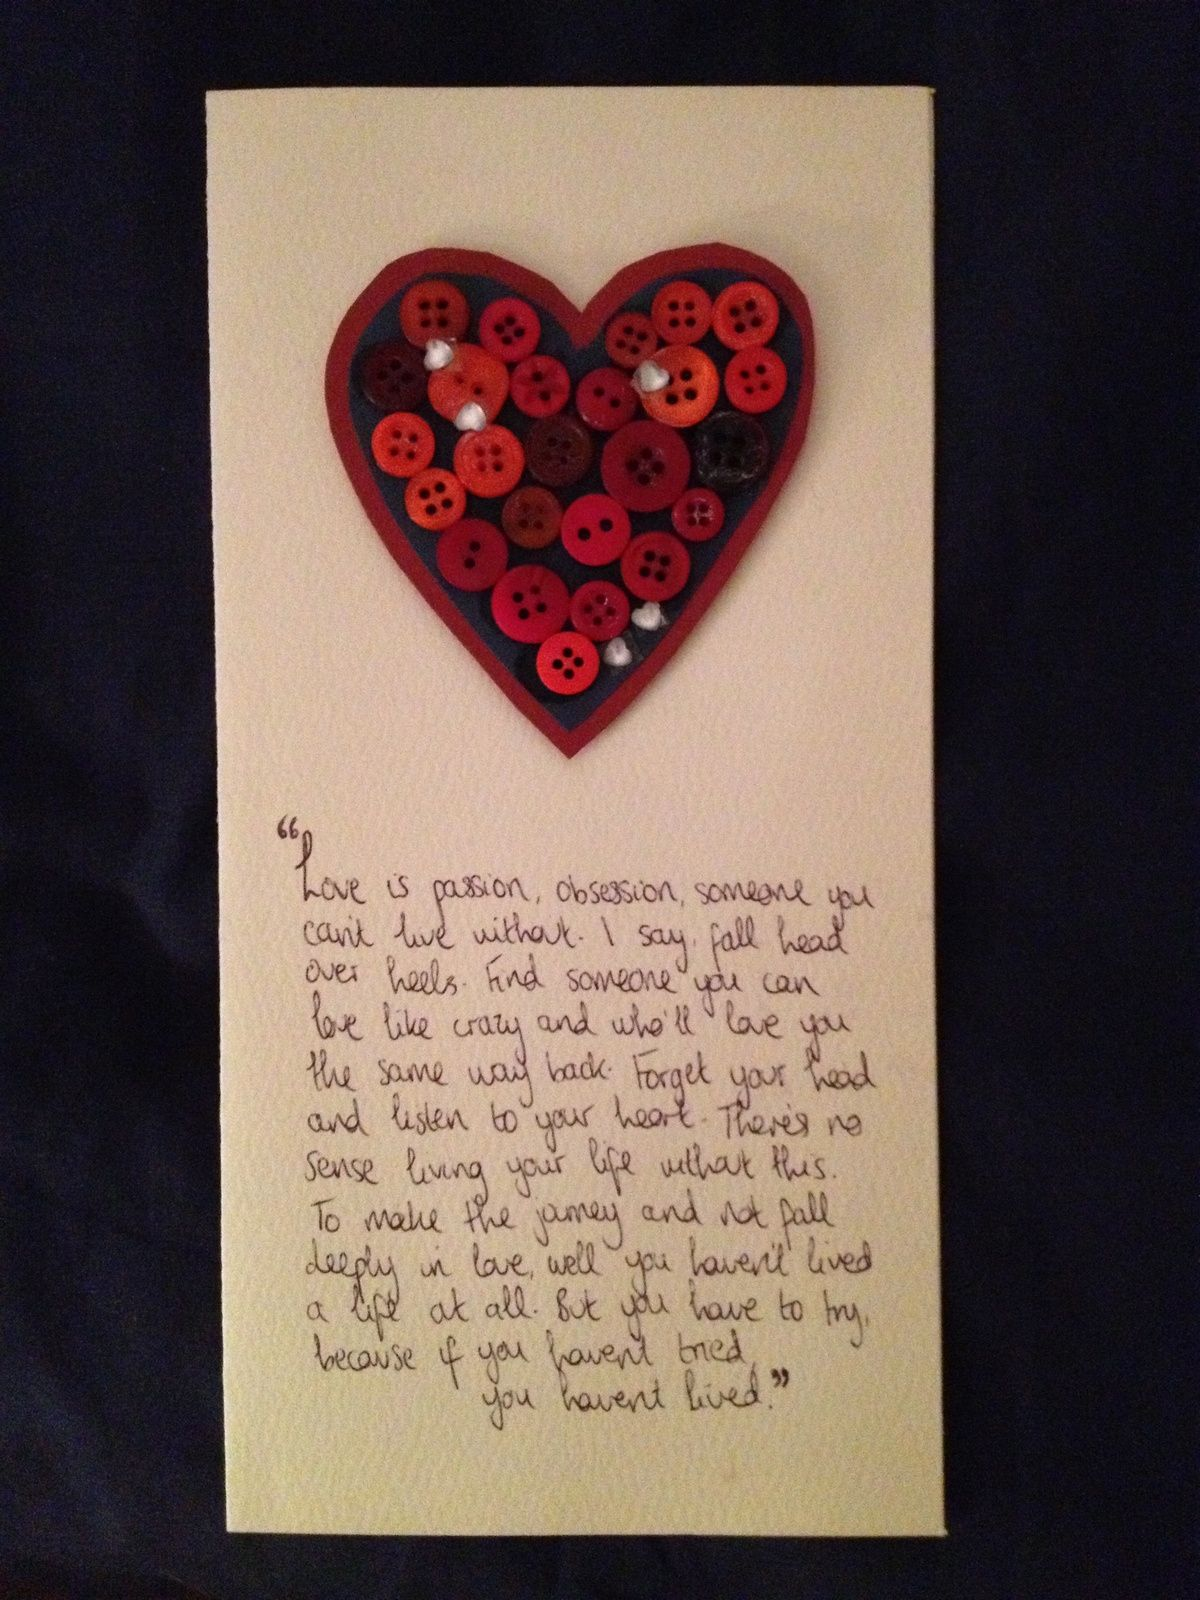 Db074030ea7ae1a7f4b1294c18d57b2a Jpg 1 200 1 600 Pixels 6 Month Anniversary Boyfriend 6 Month Anniversary Cards For Boyfriend